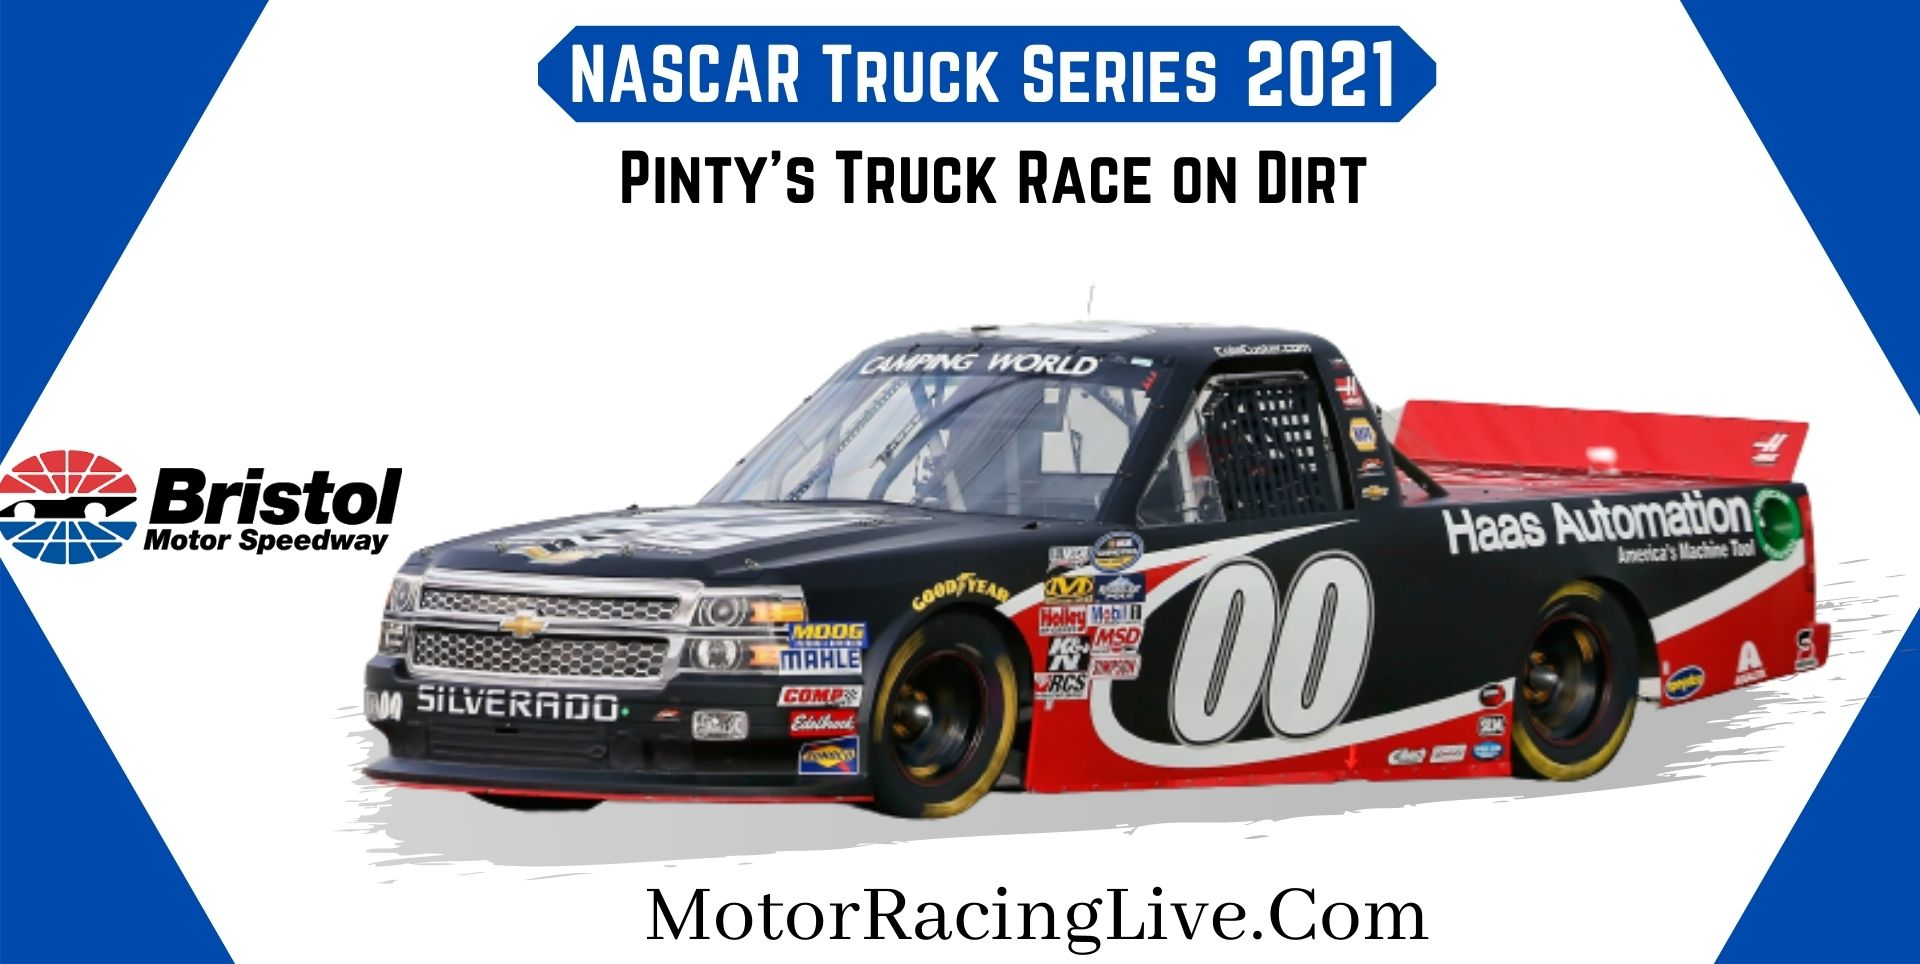 Pintys Truck Race On Dirt Nascar Truck 2021 Live Stream